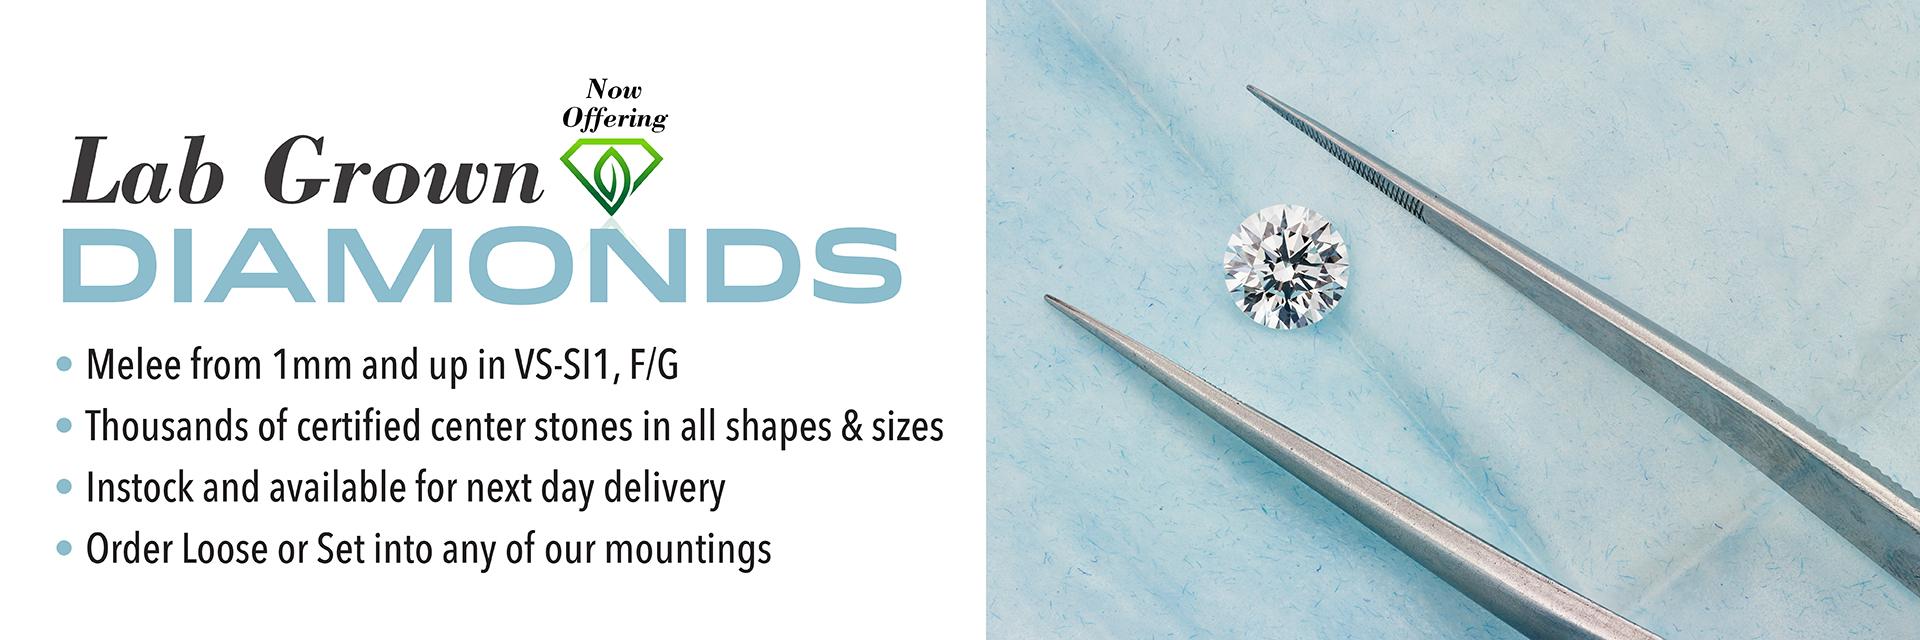 Mountings, Semi Mounts, Finished Jewelry & Custom Jewelry in New